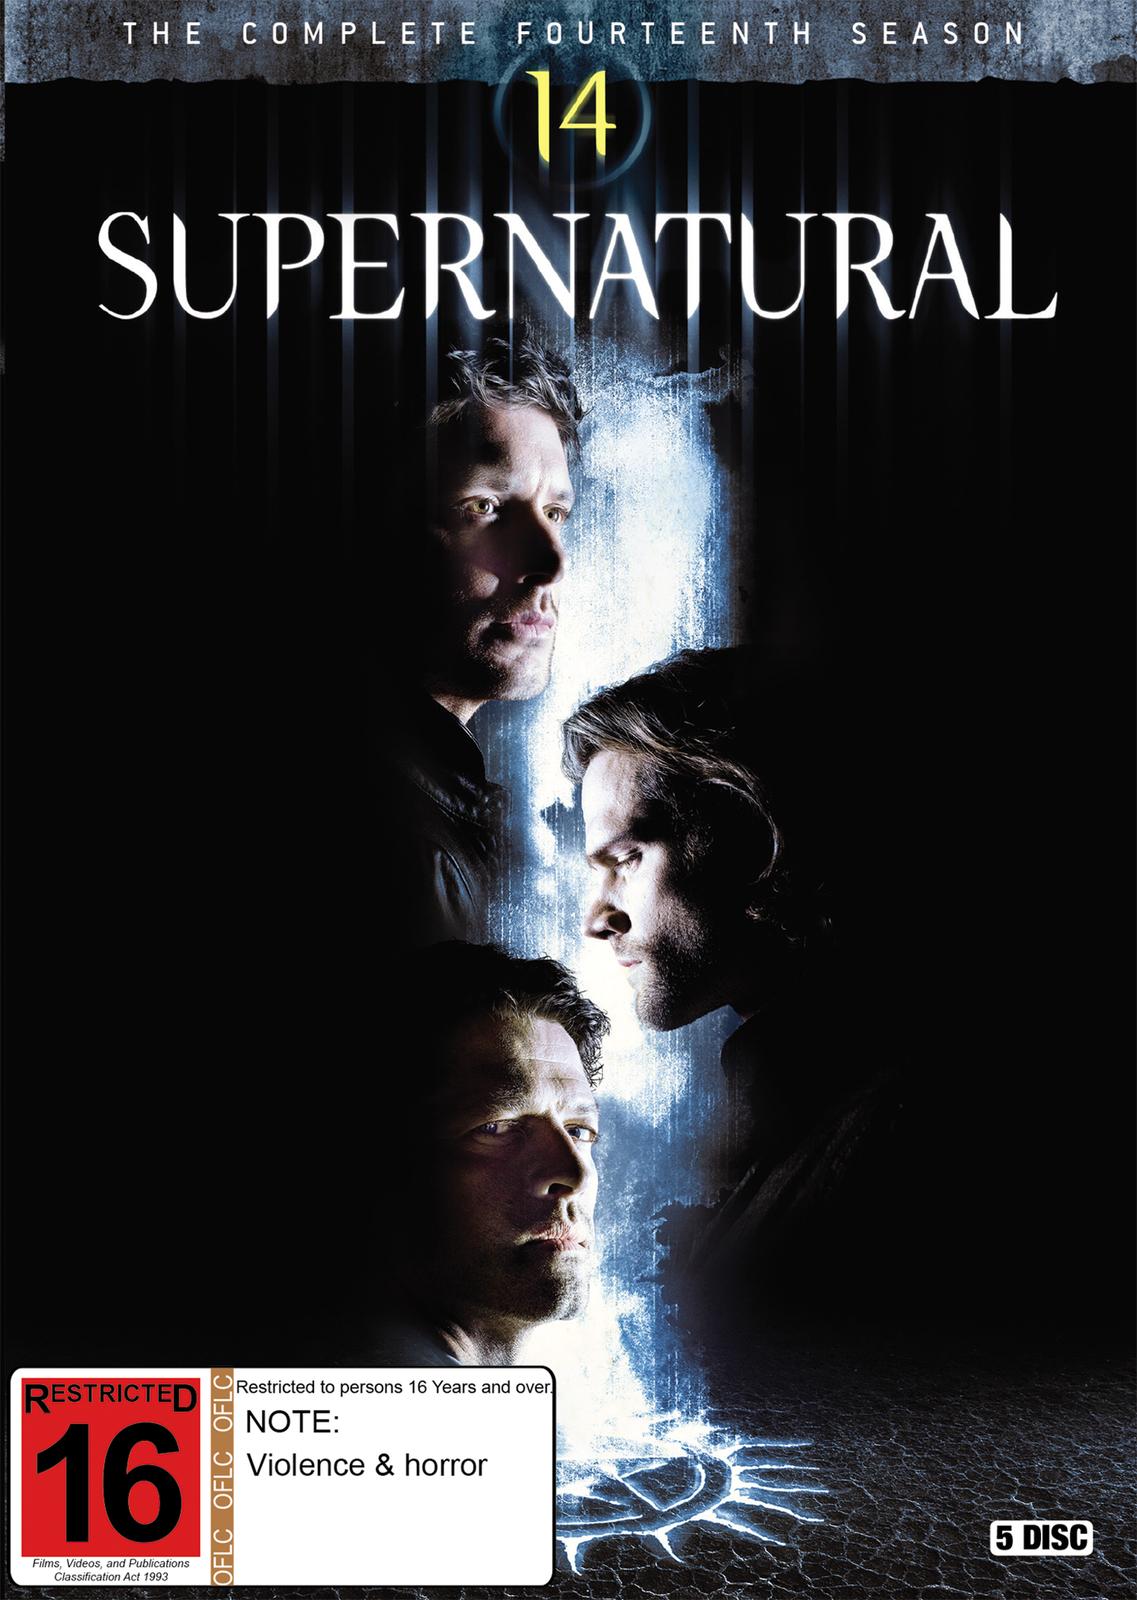 Supernatural: The Complete Fourteenth Season on DVD image